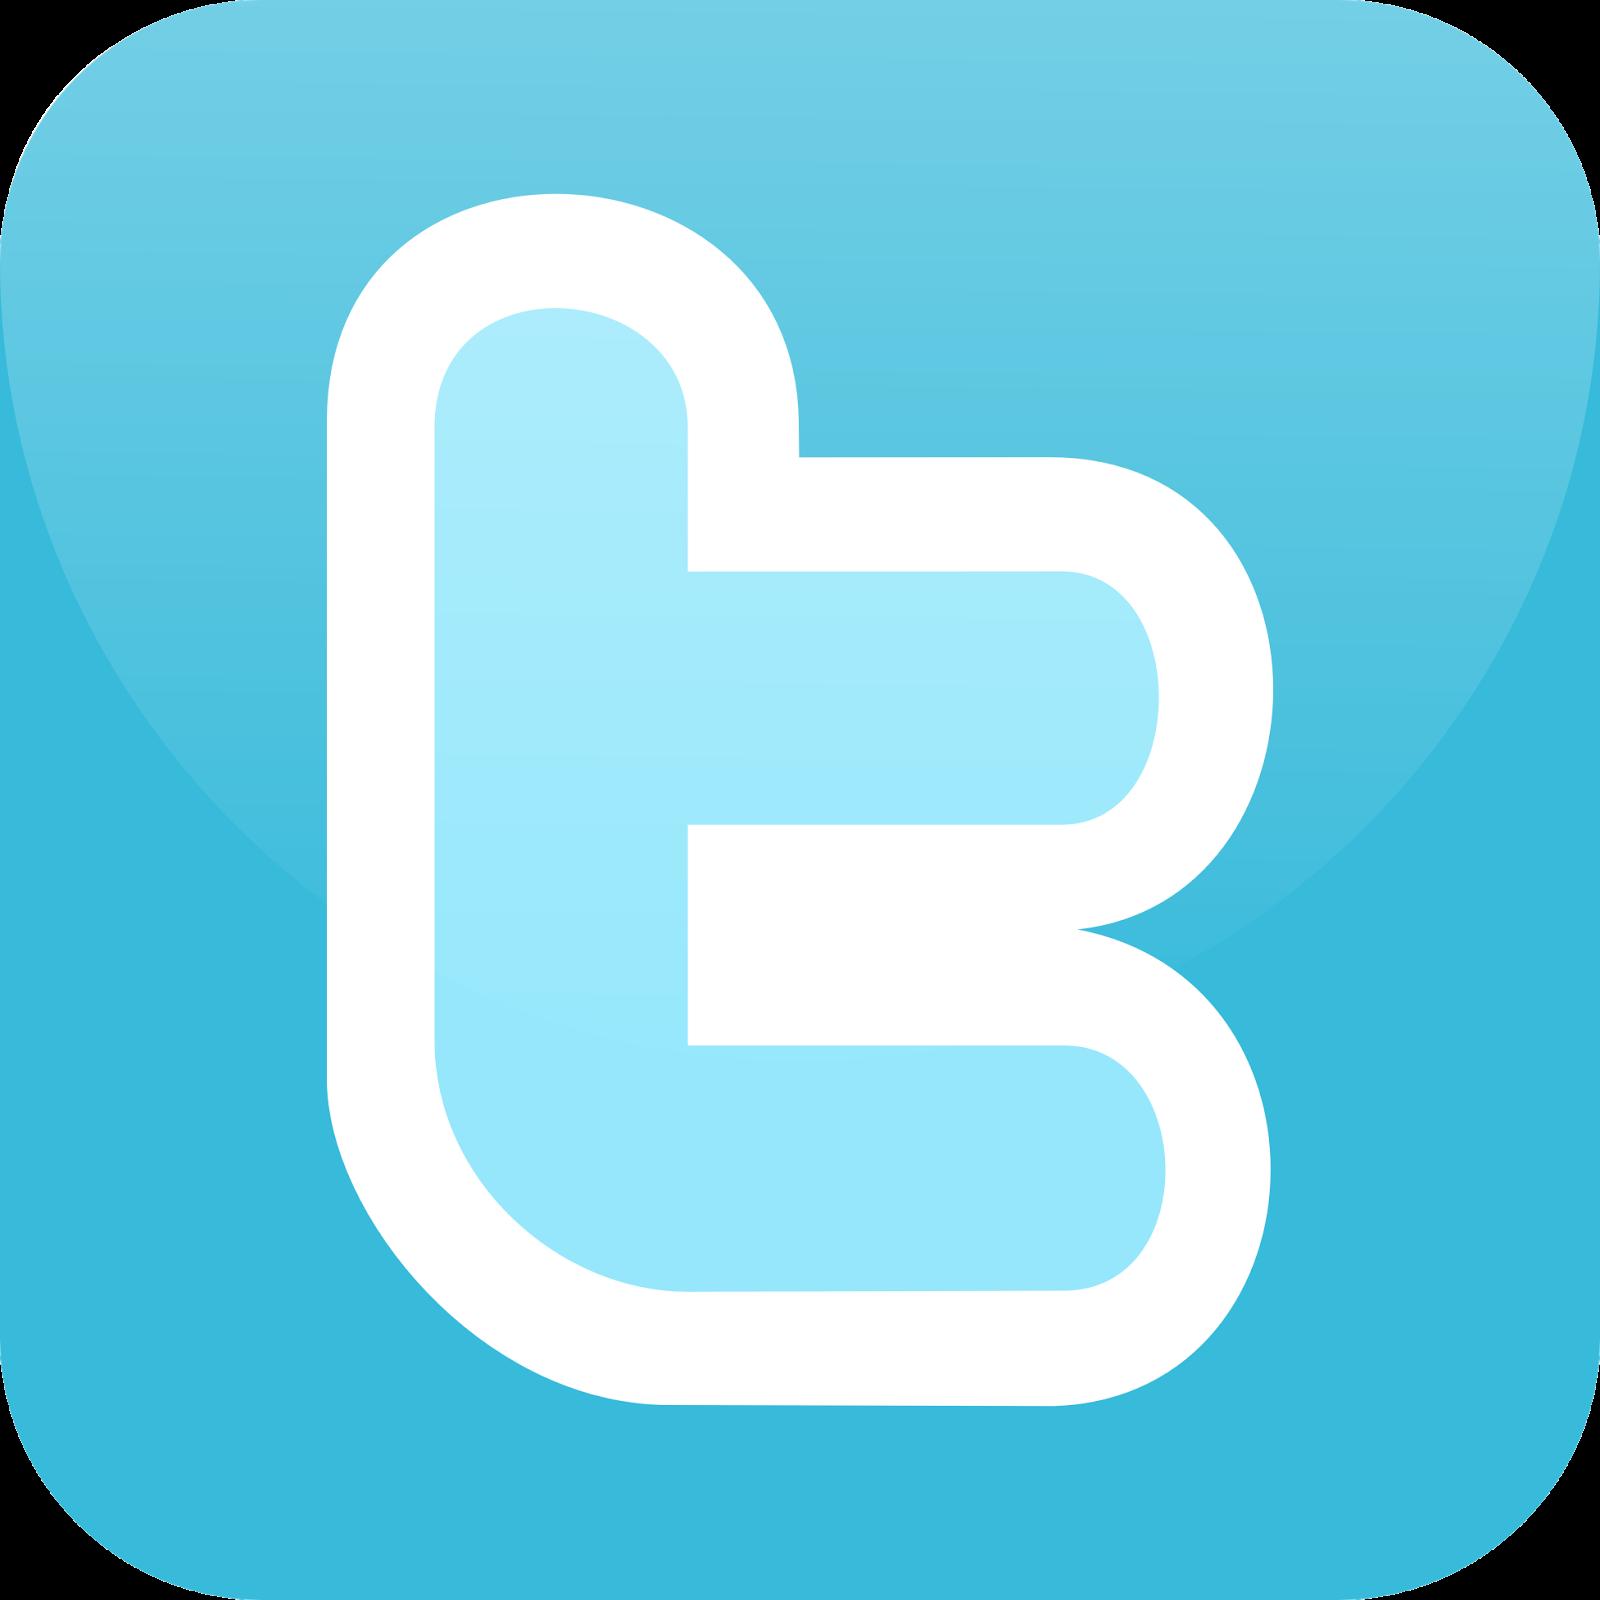 ¡Visita nuestro Twitter!